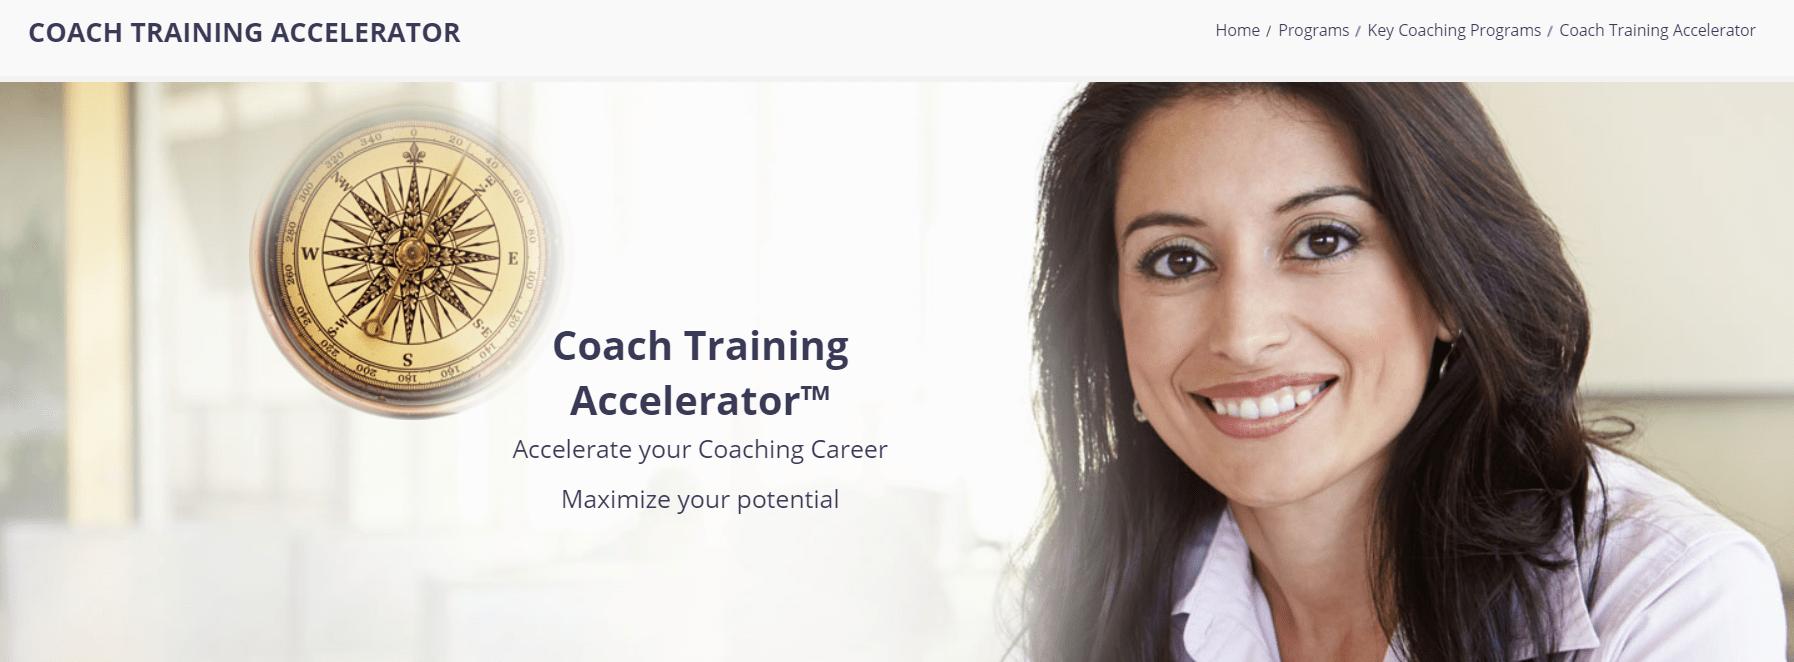 Coach Training Alliance Review- Coach Training Accelerator